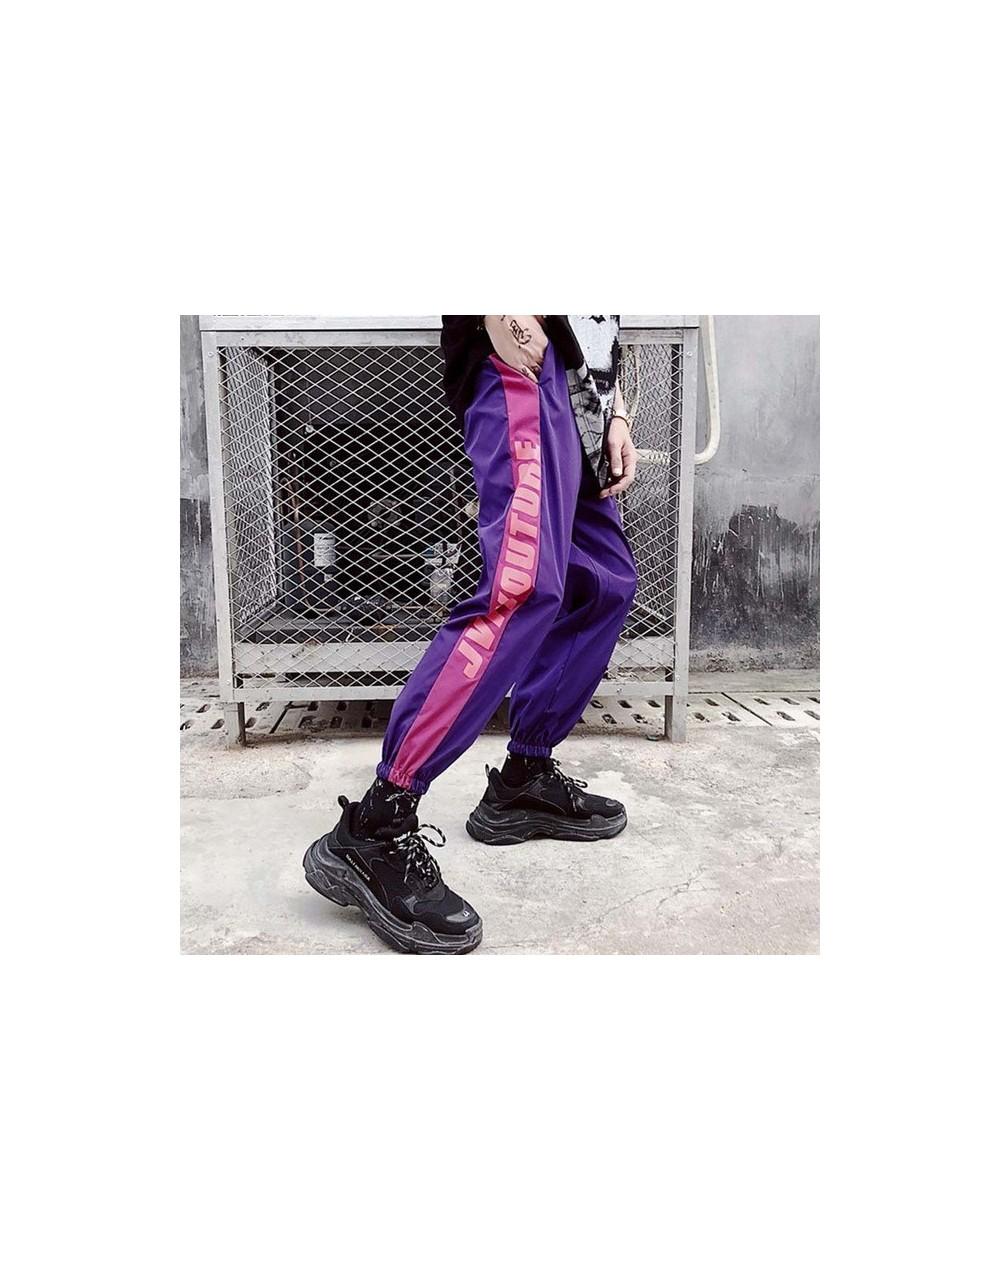 Hot Big Pockets Cargo pants women High Waist Loose Streetwear pants Baggy Tactical Trouser hip hop high quality joggers pant...